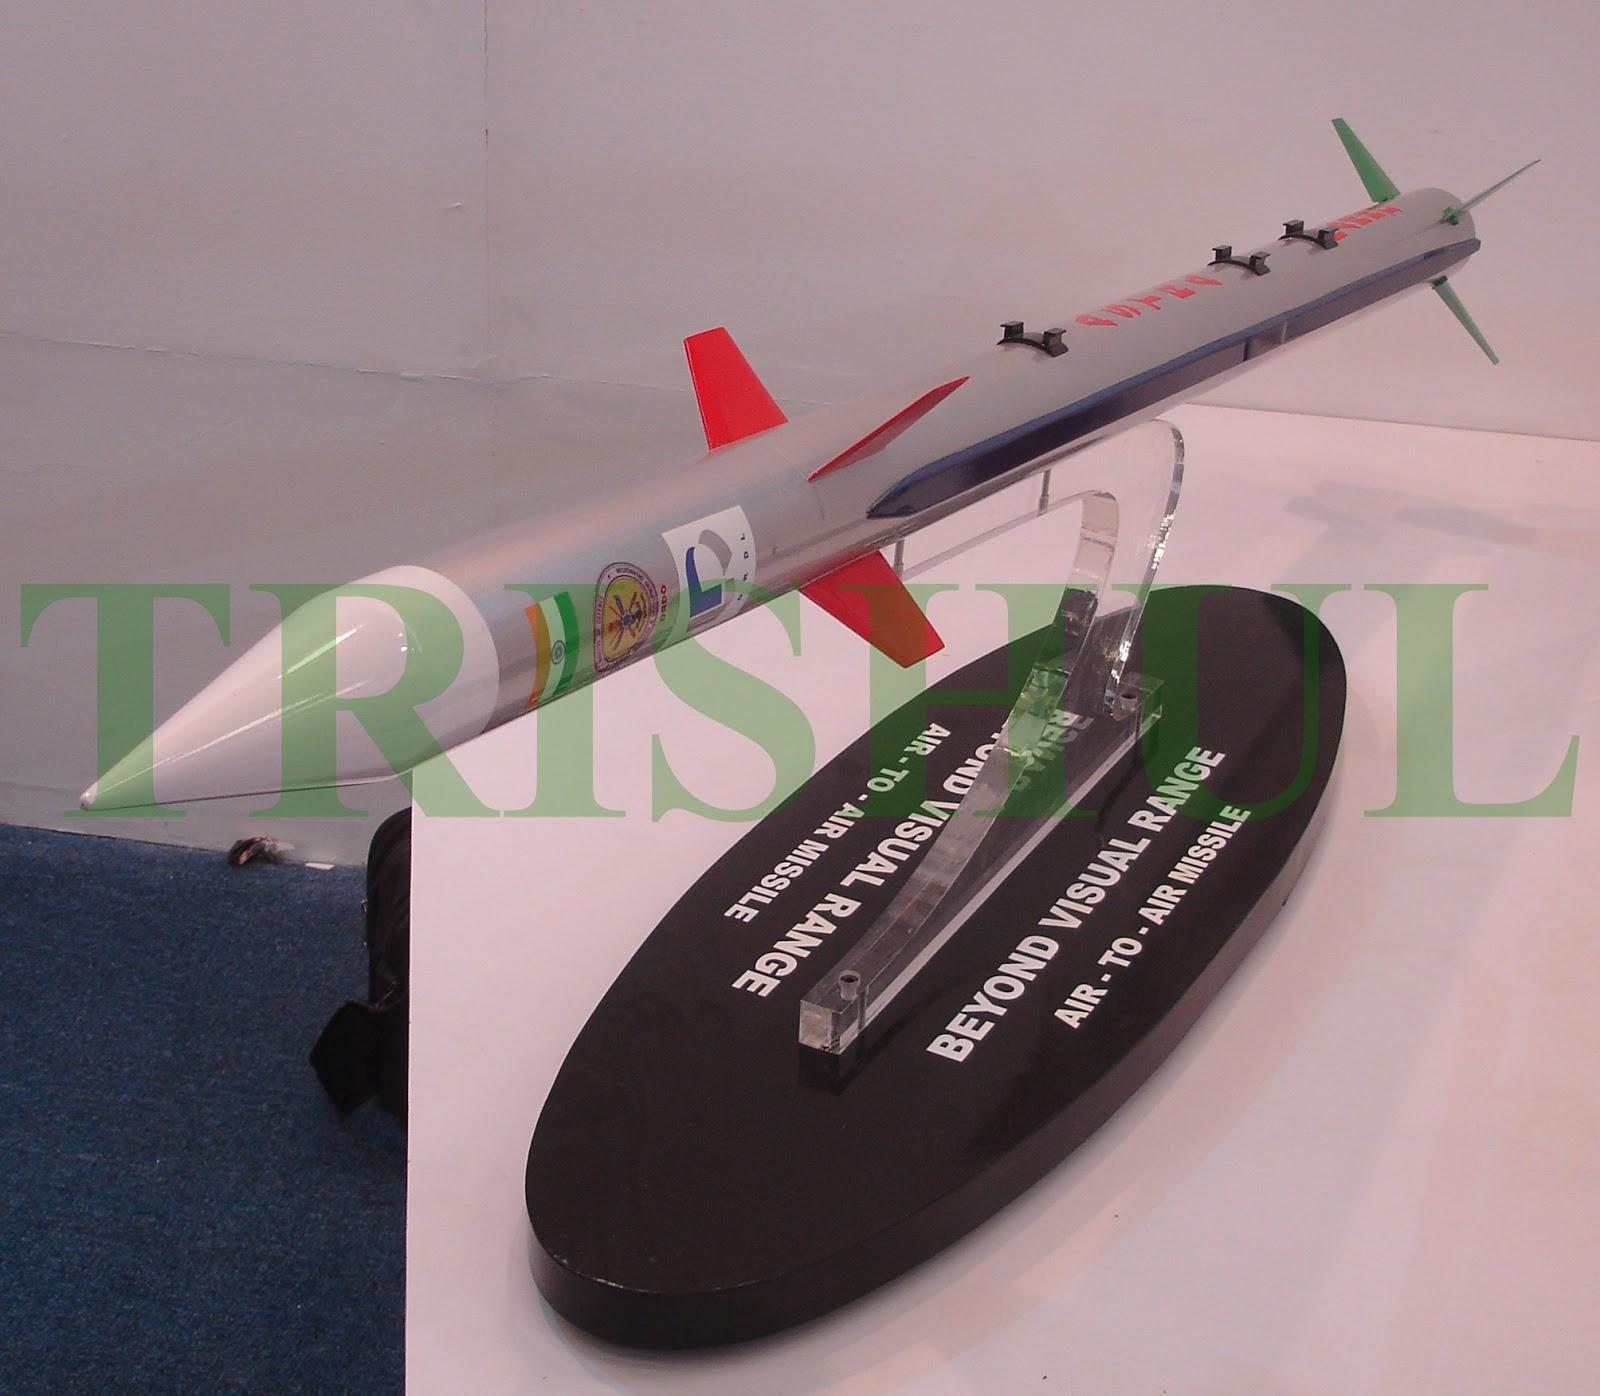 Astra MK2 scale model